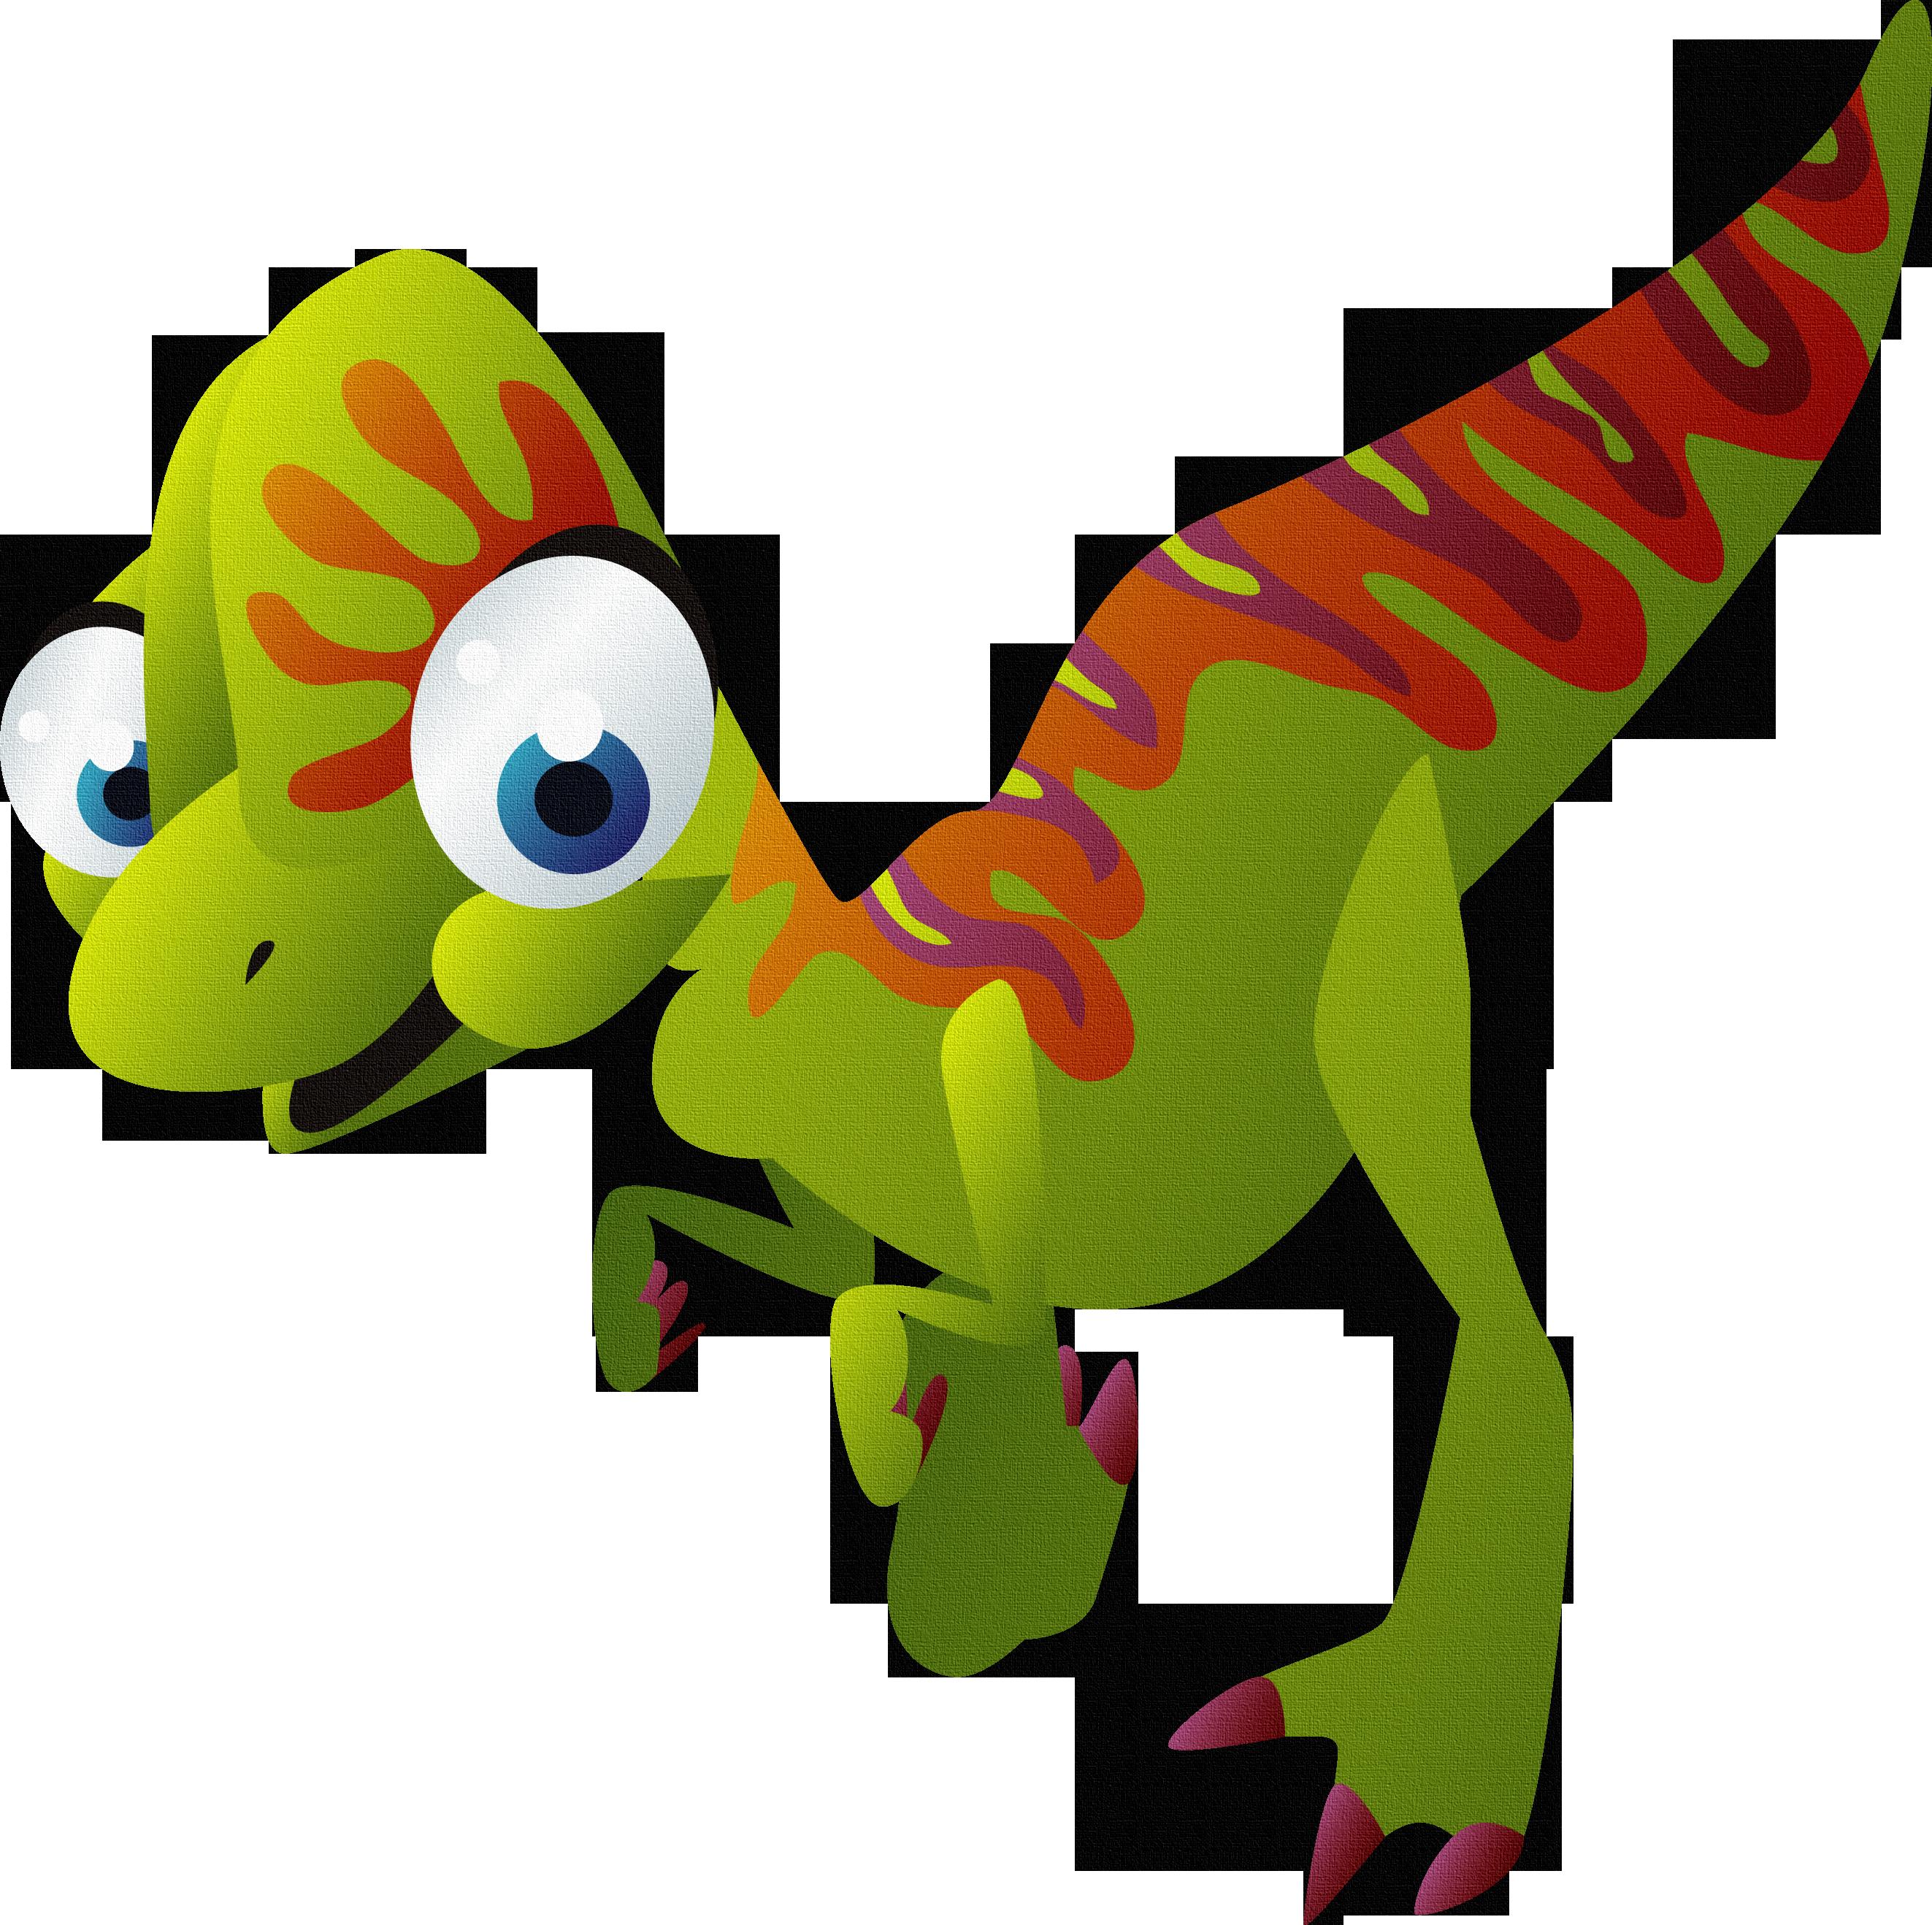 Animales infantiles dinosaurio - Imagenes animales infantiles ...